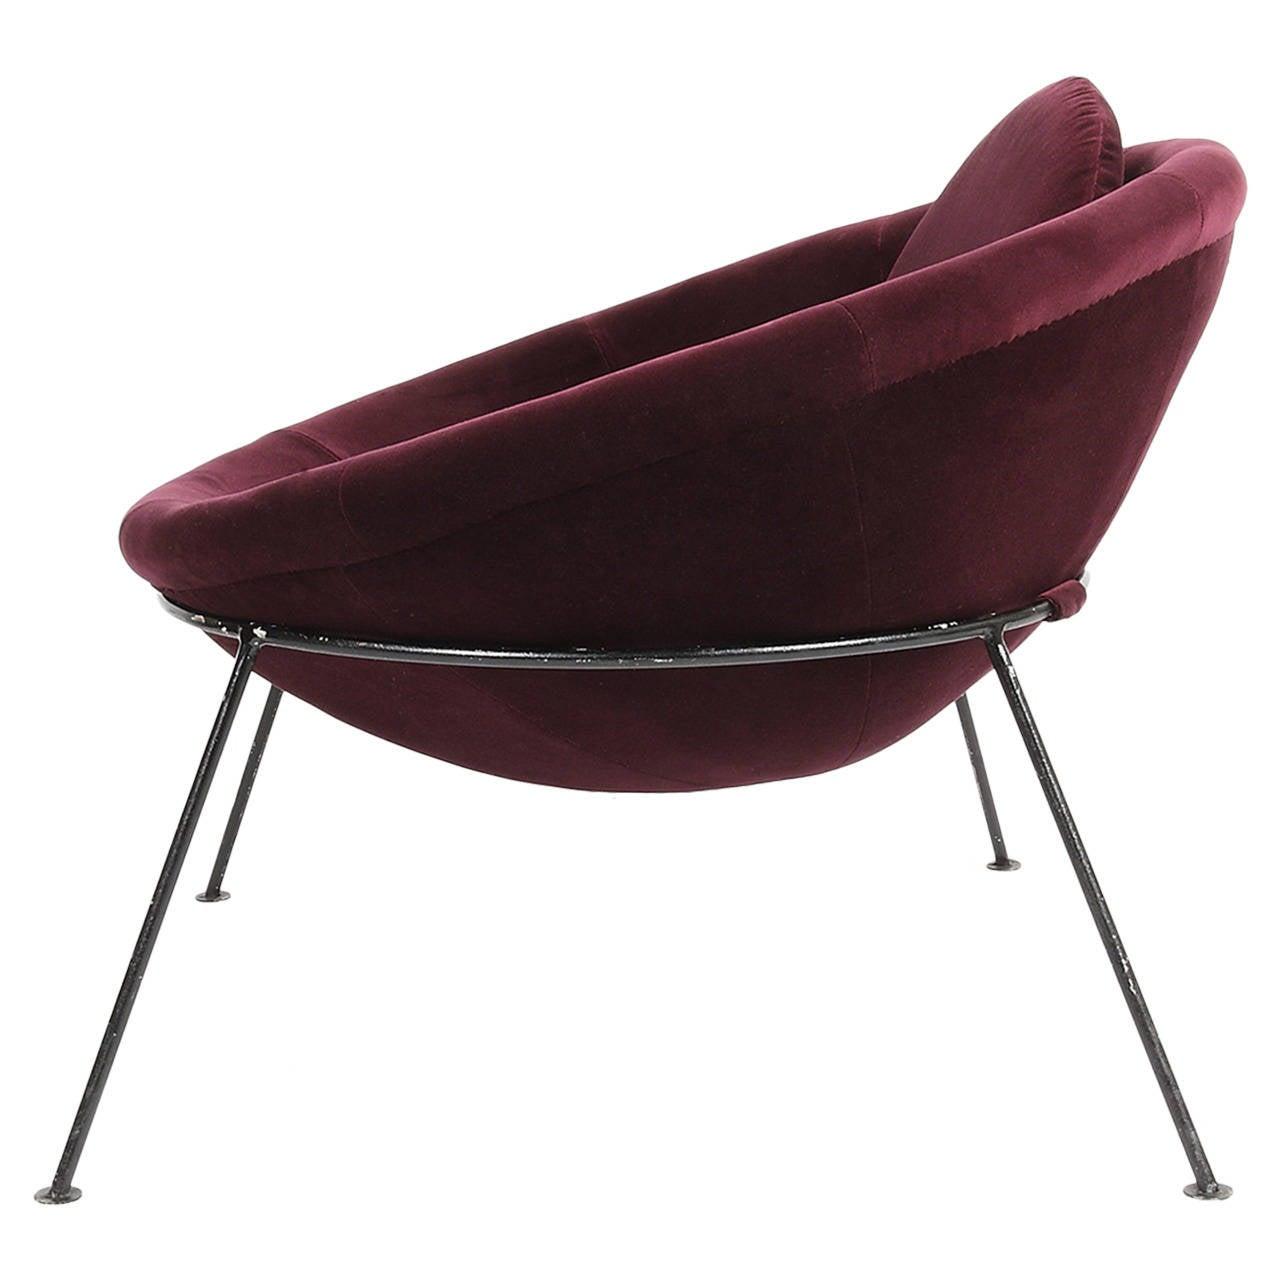 thonet chair styles desk goes down lina bo bardi's